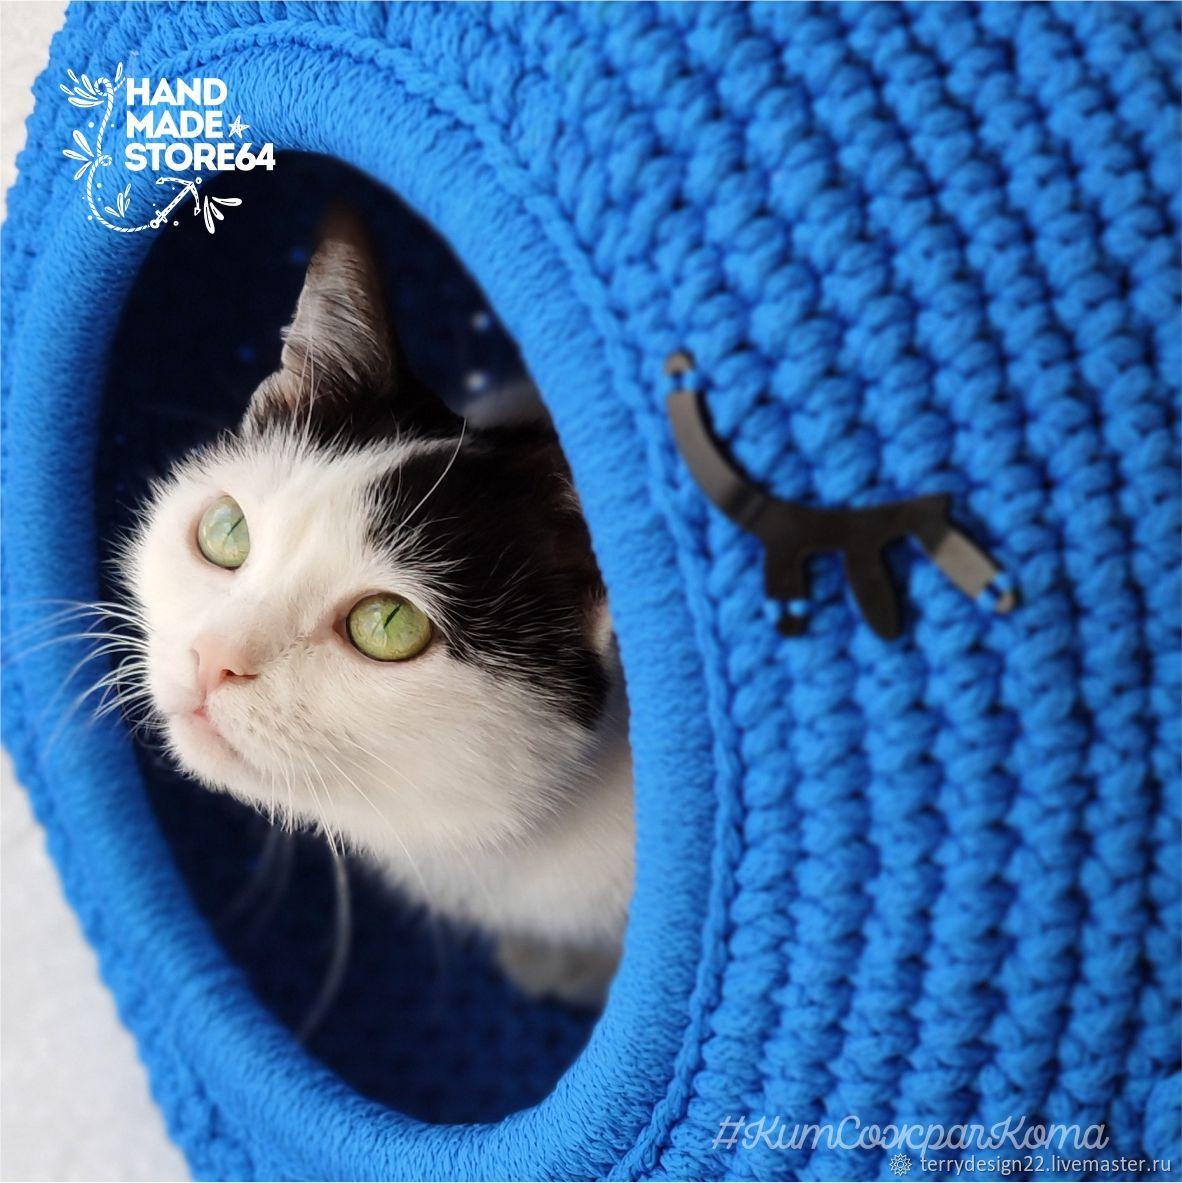 #Citarrella, Cocodomol, HOME of the FISH-WHALE, Pet House, Krasnodar,  Фото №1